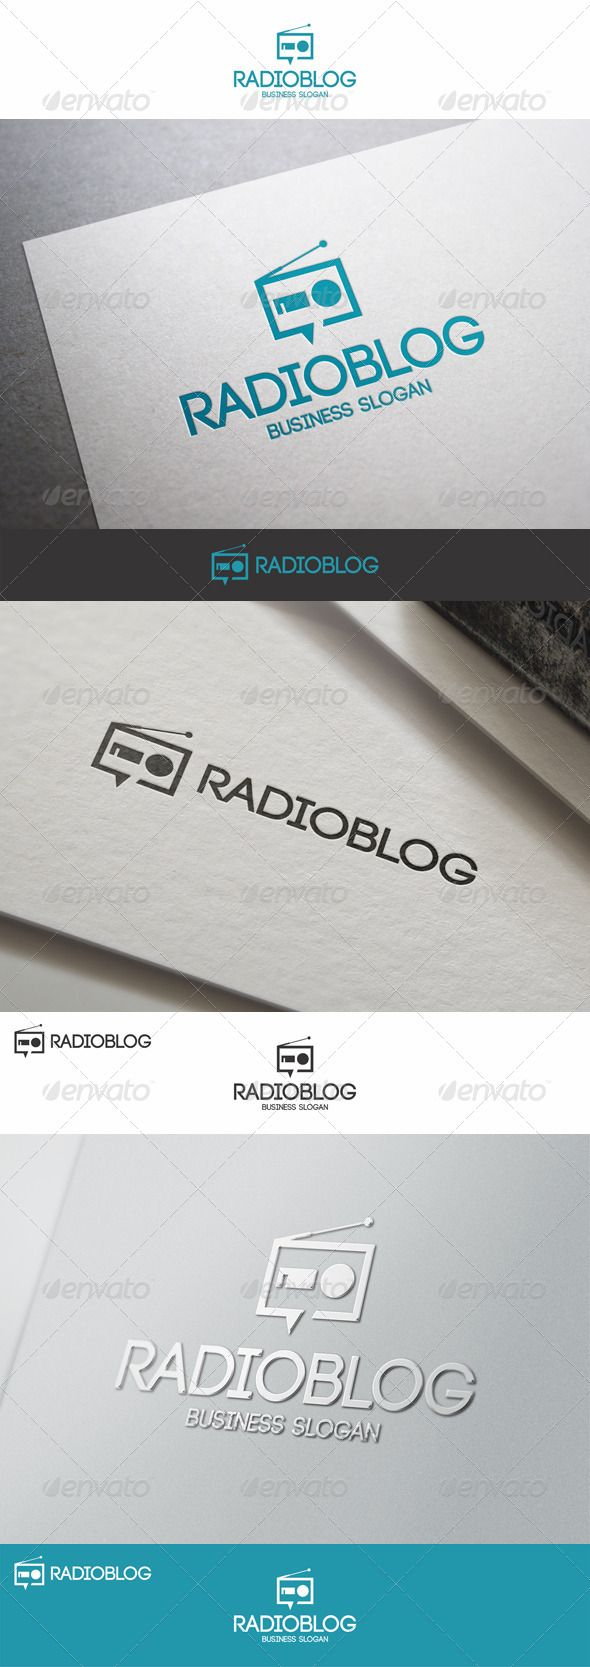 Radio Blog Logo Template – suitable for websites, radio blogs, software and applications, audio news, radio station, radio chat , blogs, radio channels, media business, entertainment, audio bloggers, radio studio, audio designers, etc.